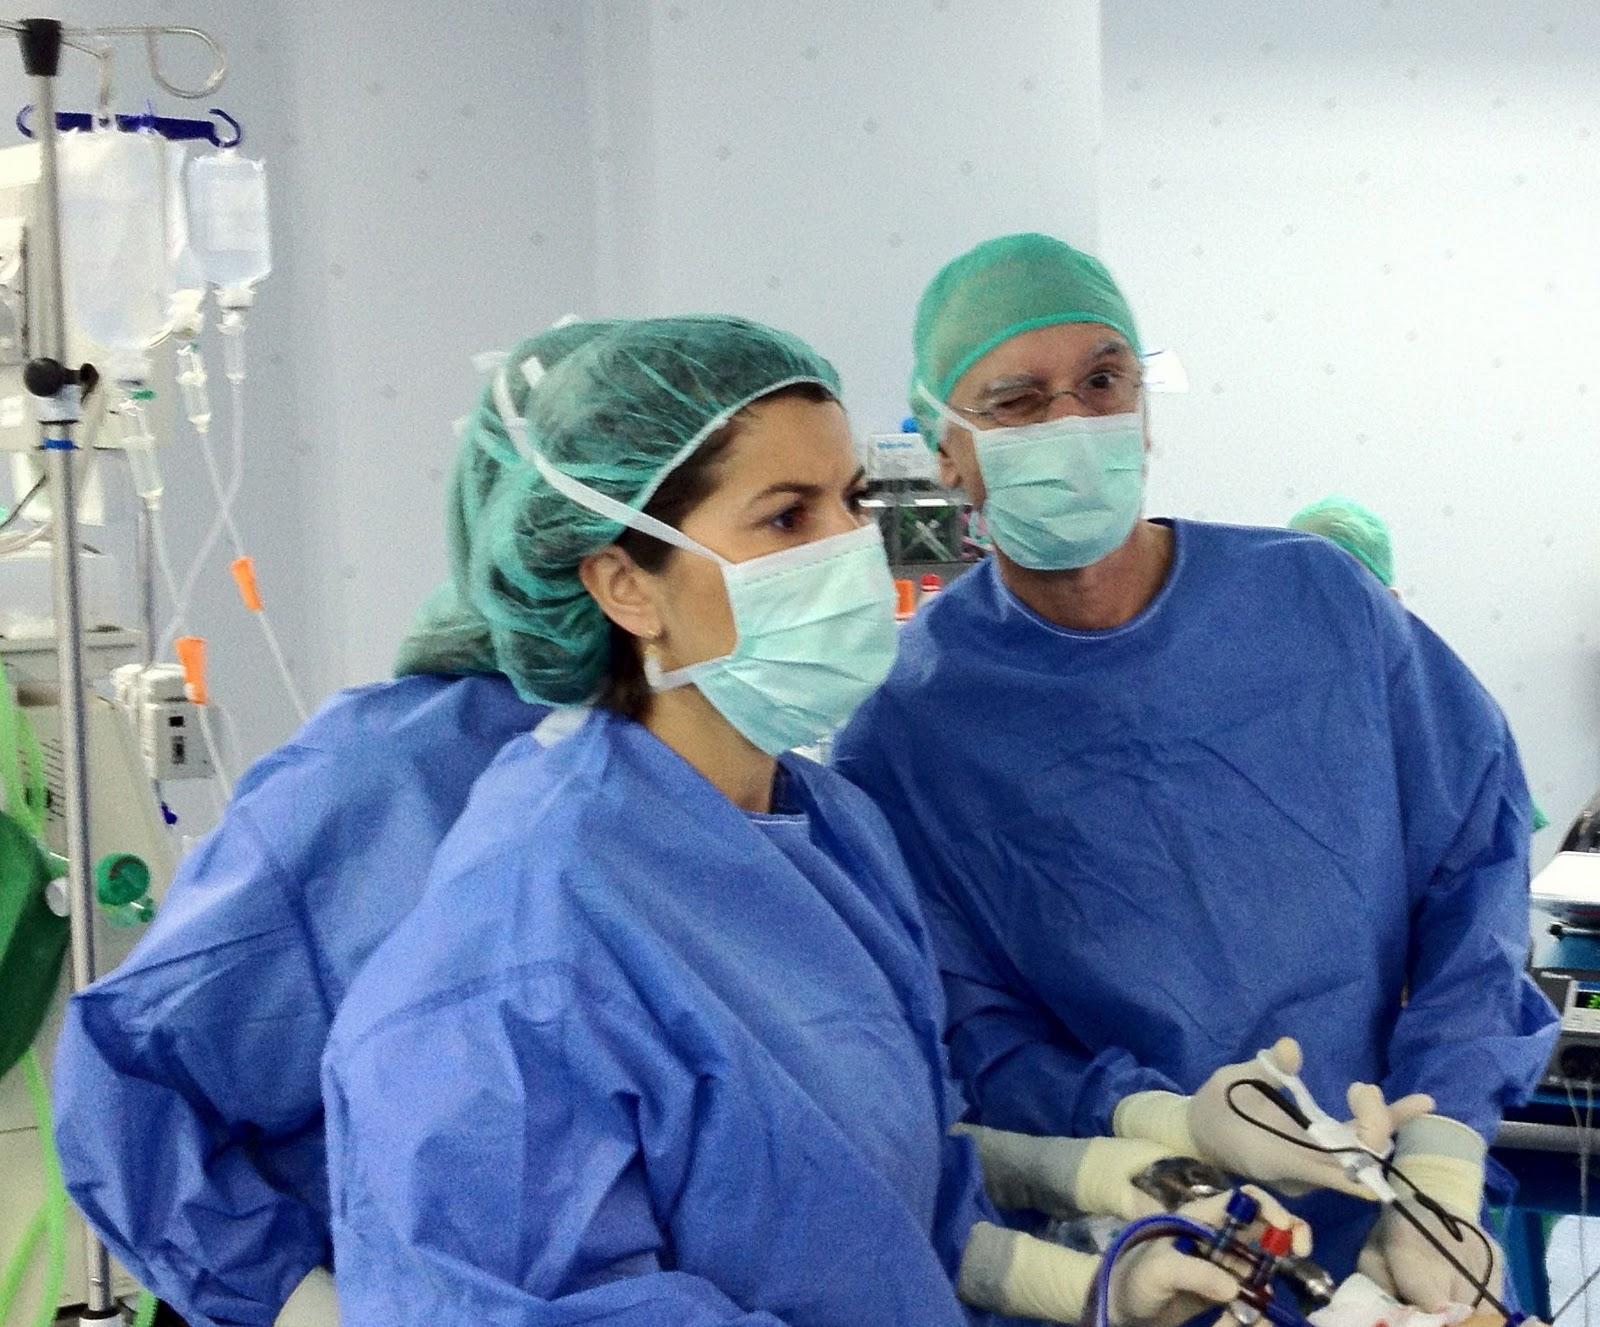 cirugia de prostata laser verde hospital hospitales turin 2